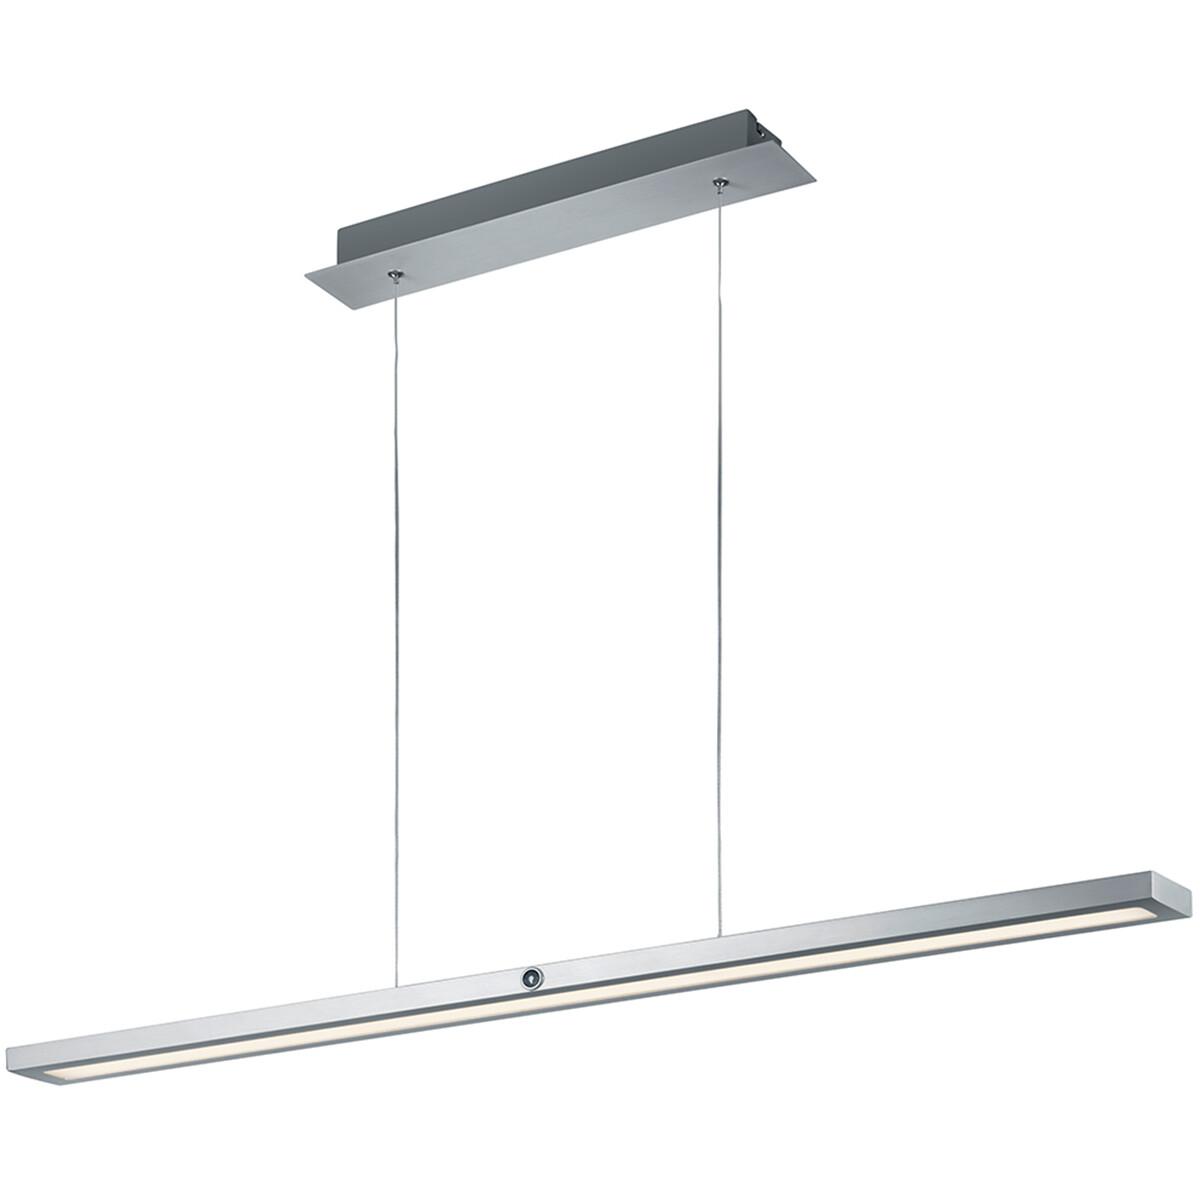 LED Hanglamp - Hangverlichting - Trion Sinas - 45W - Warm Wit 3000K - Rechthoek - Mat Grijs - Alumin